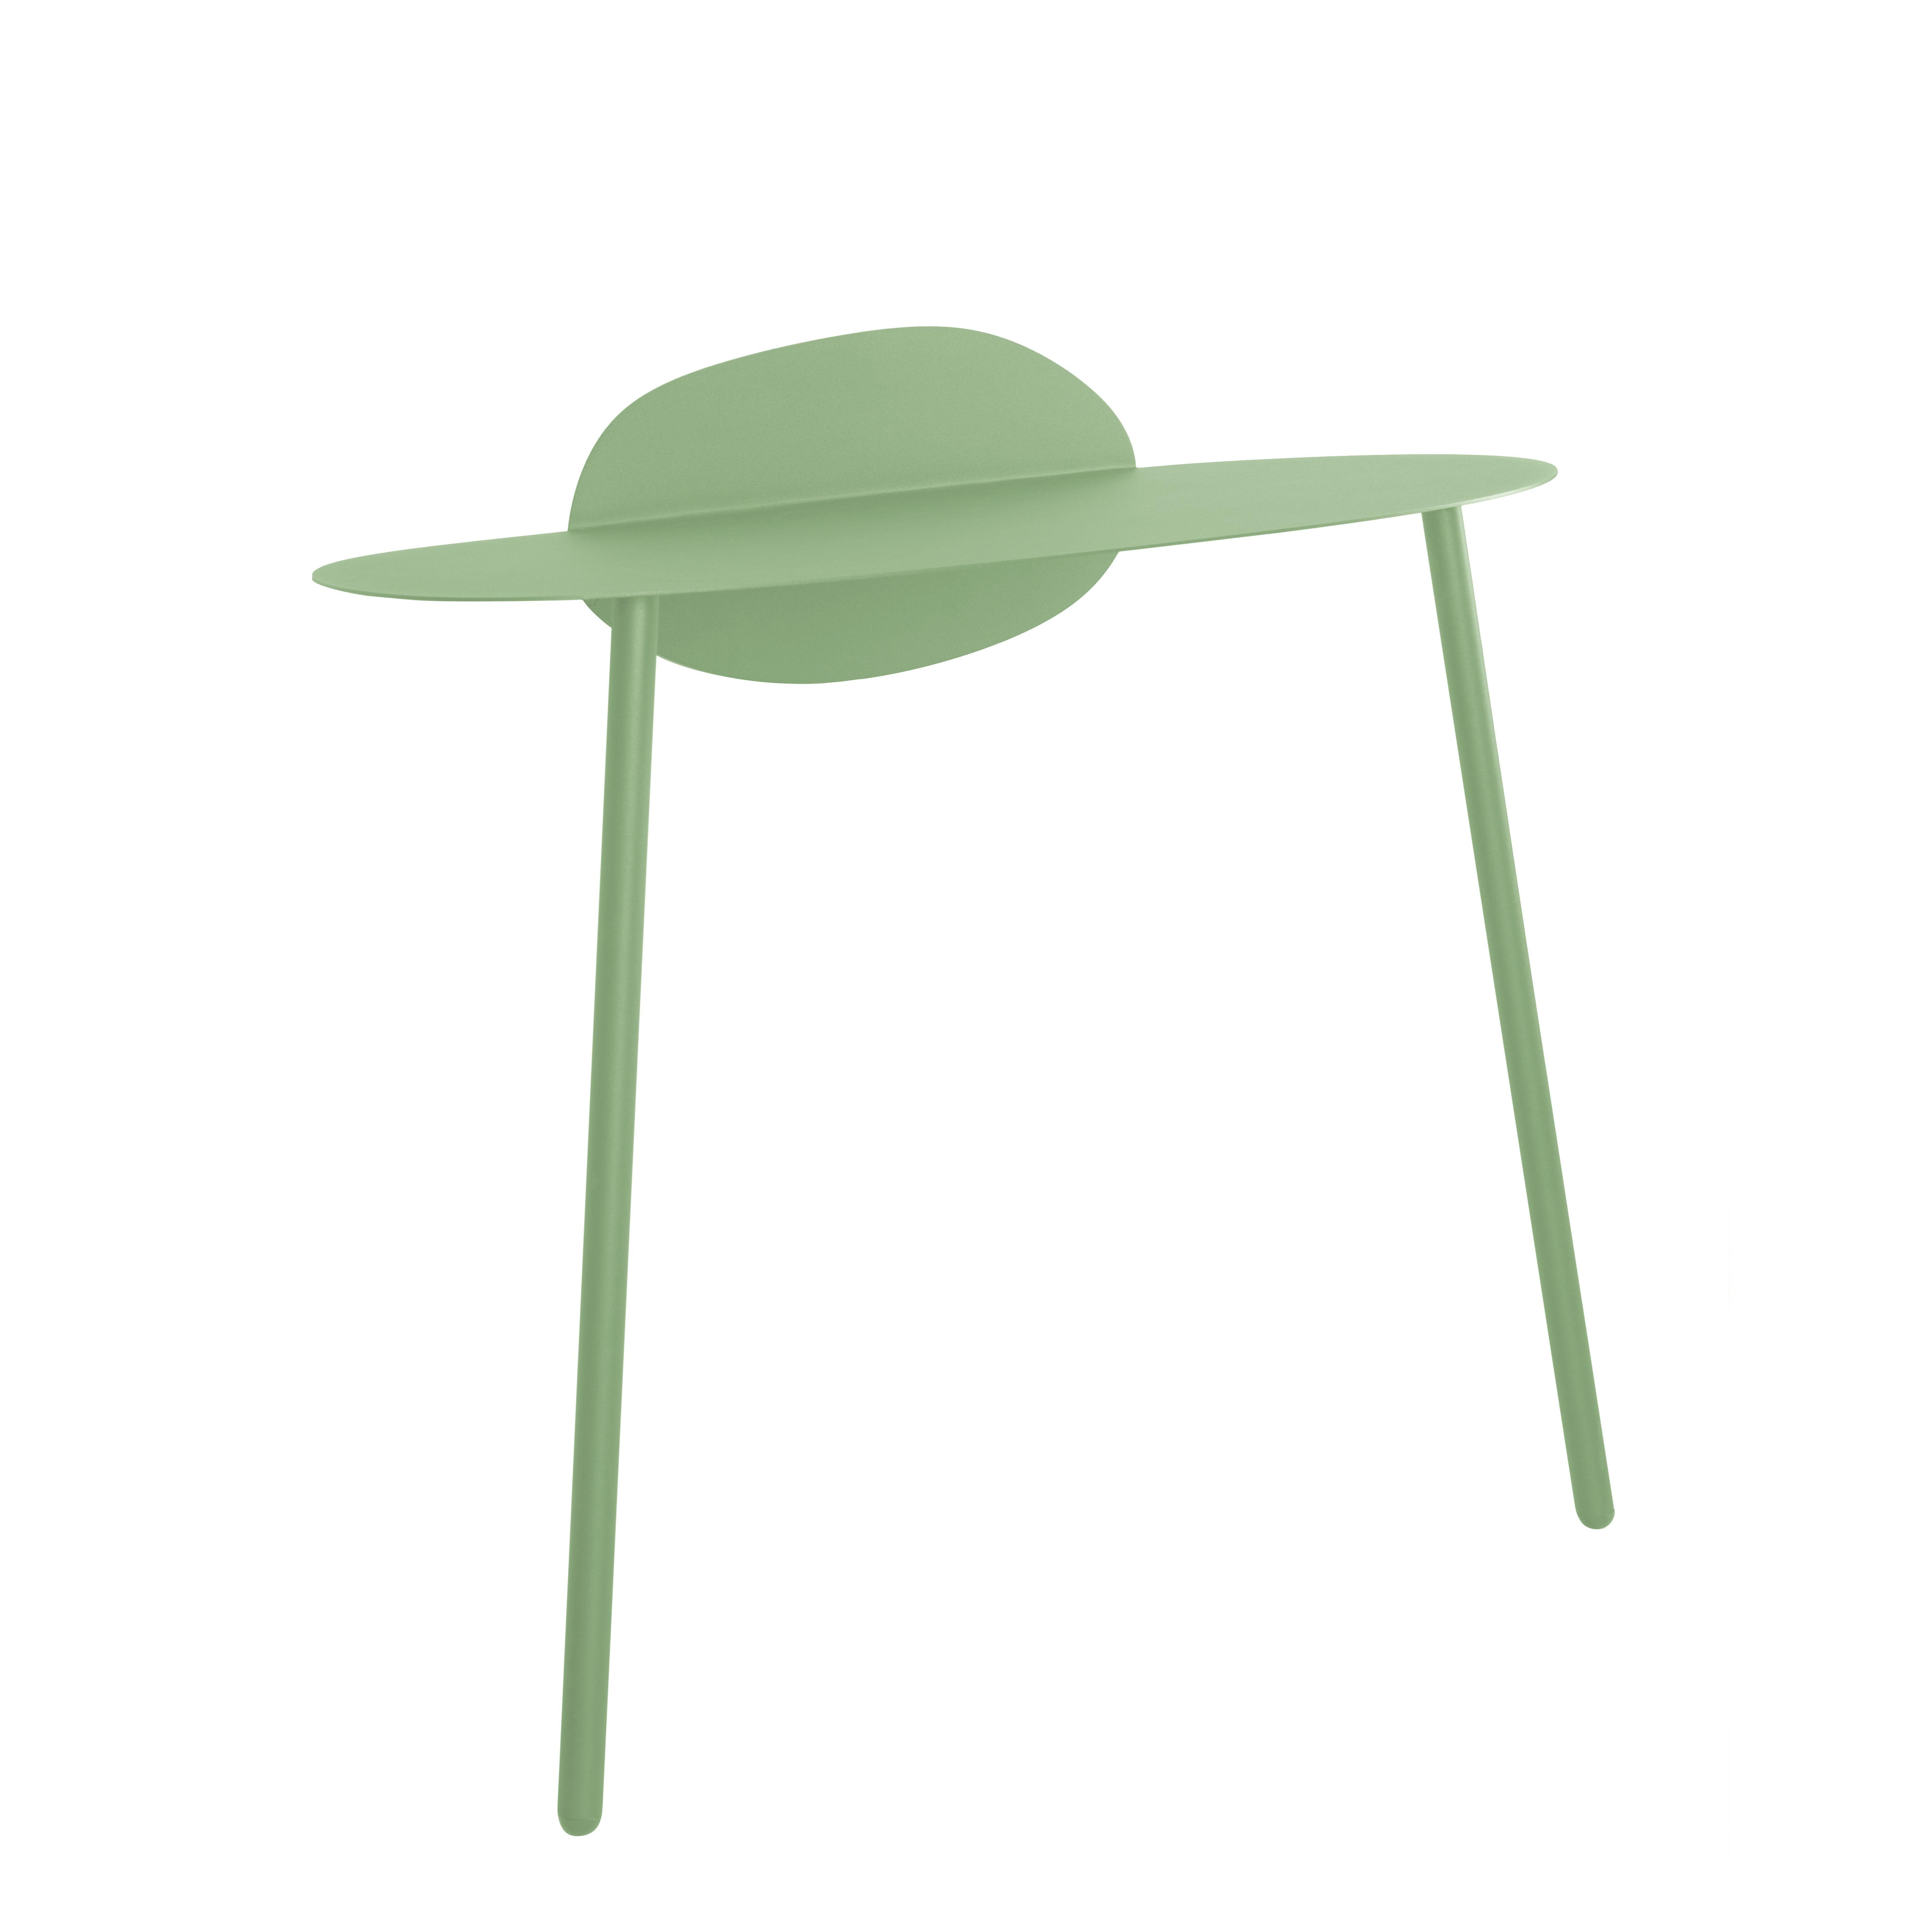 Furniture - Office Furniture - Surface Console - / Desk - Wall fastening - L 90 x Depth. 43 cm by Bibelo - Venetian sky green - Epoxy lacquered steel